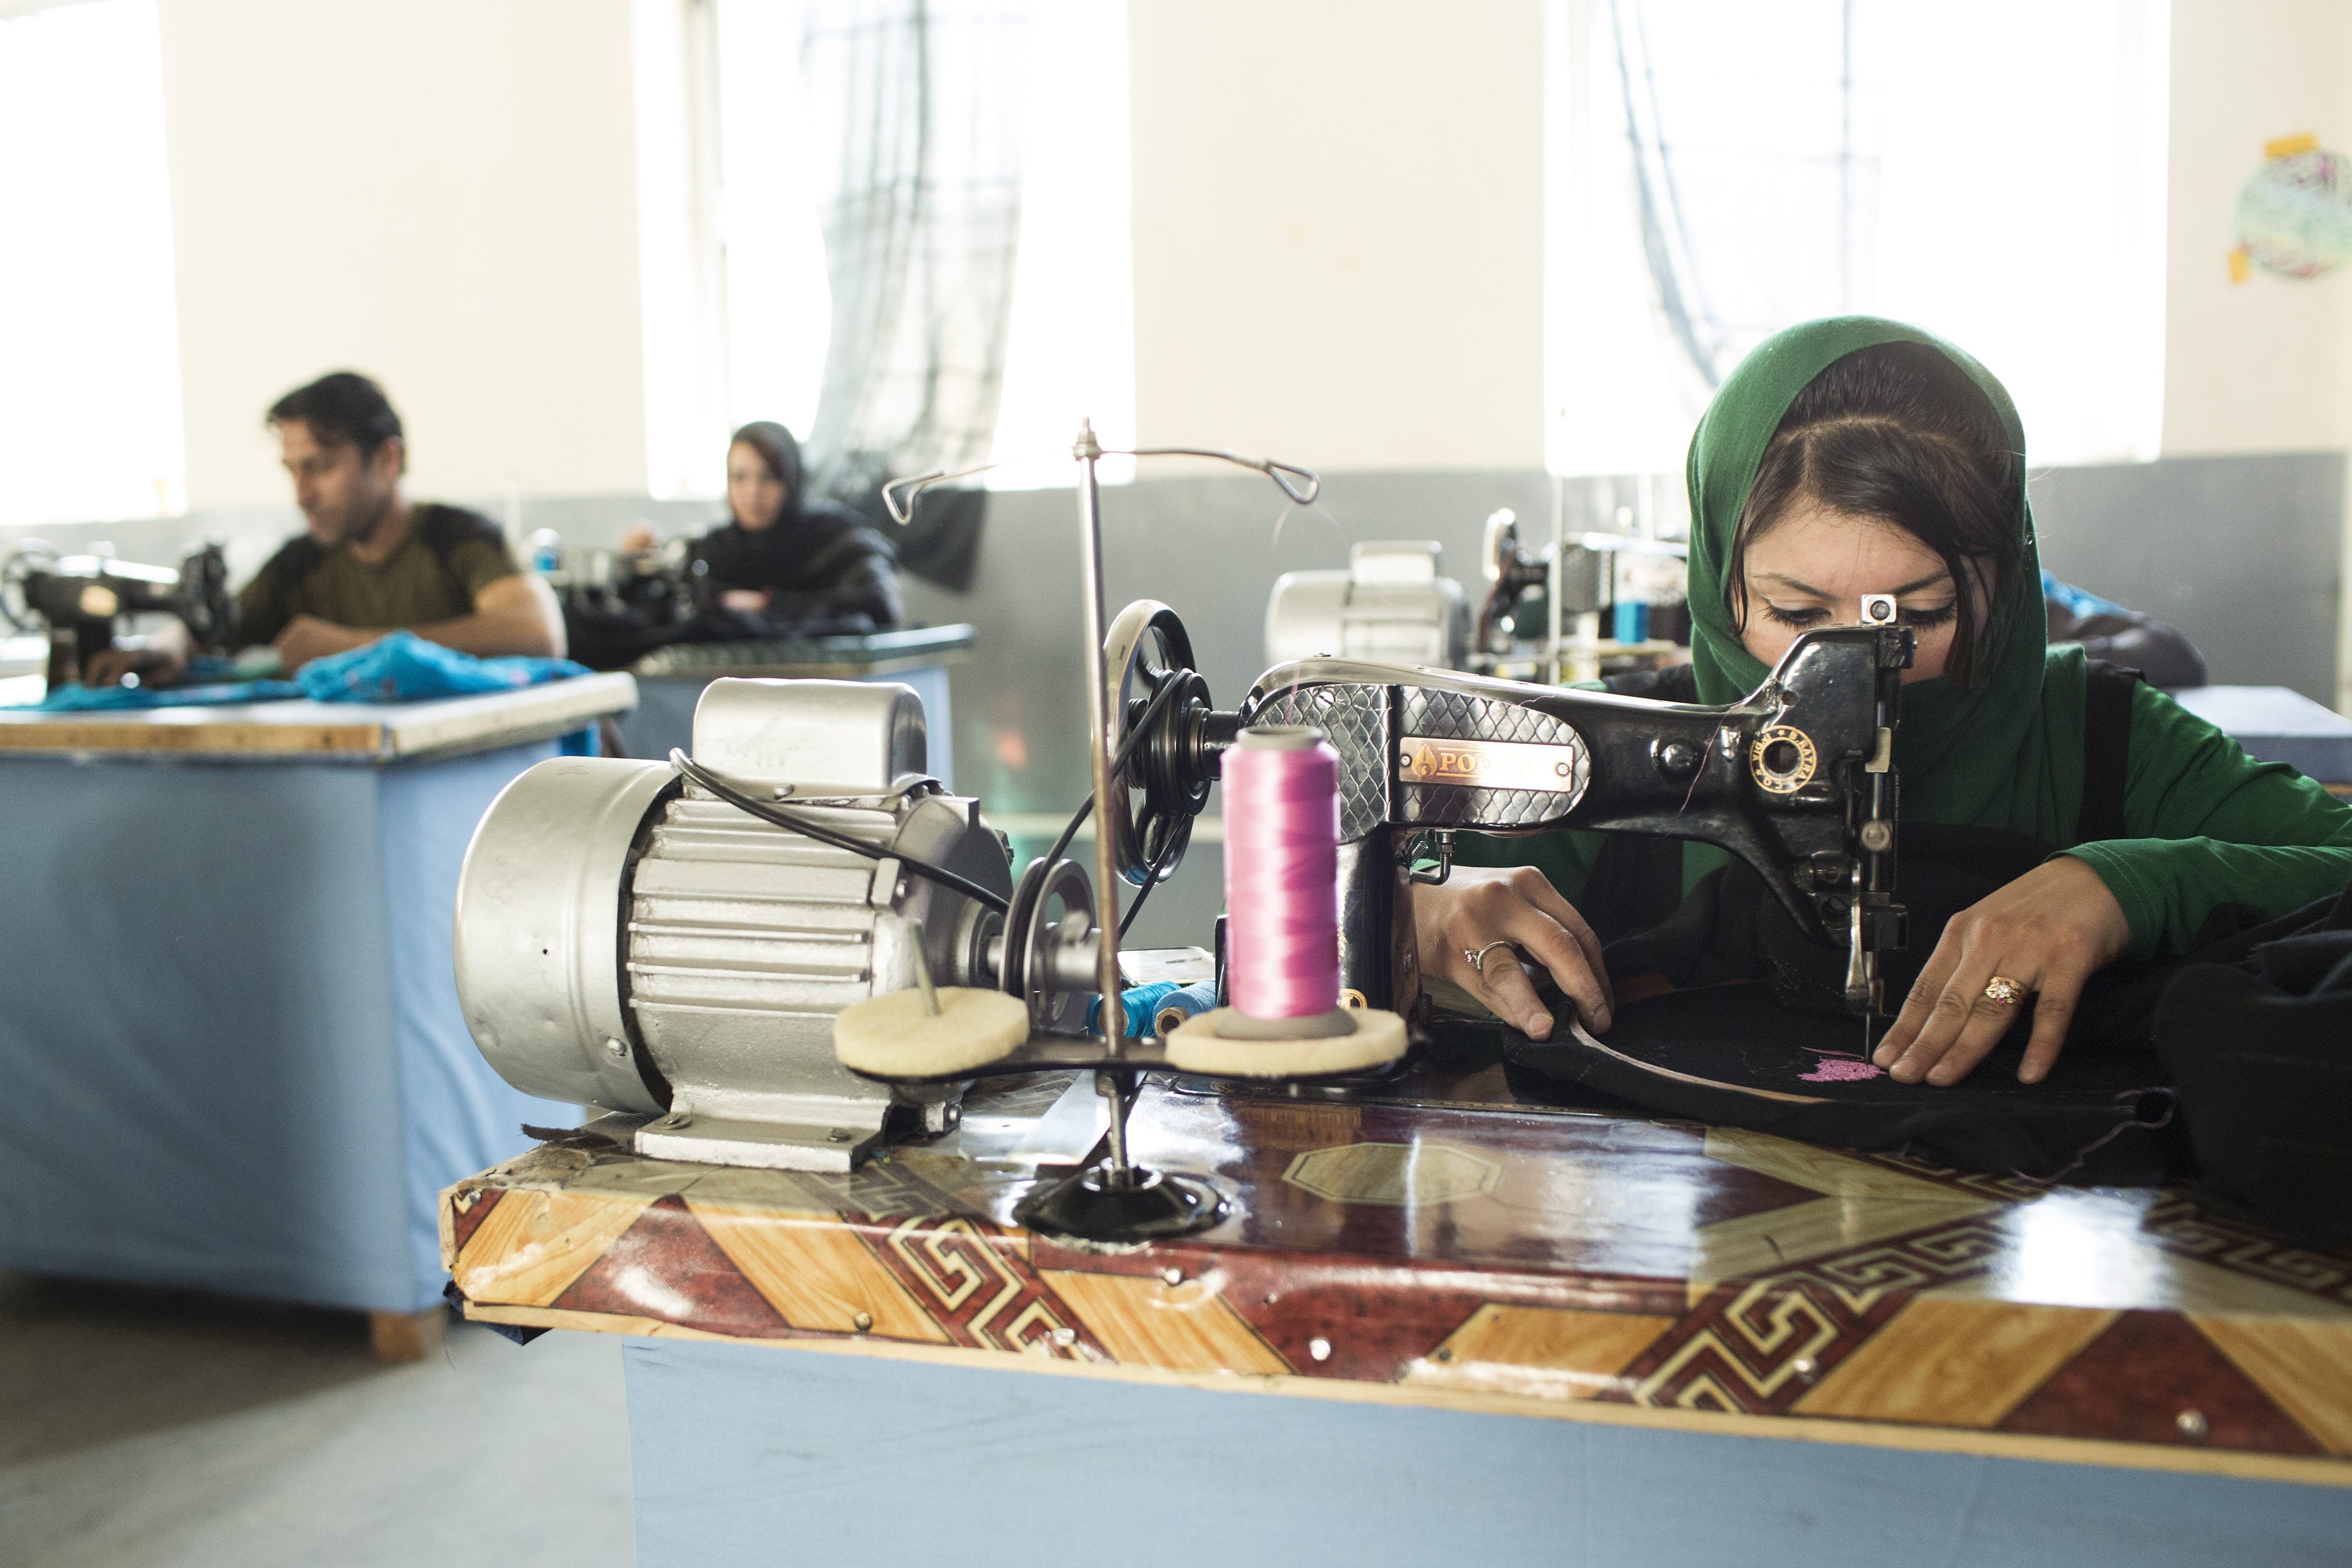 Combat Flip Flops Afghan Factory Working